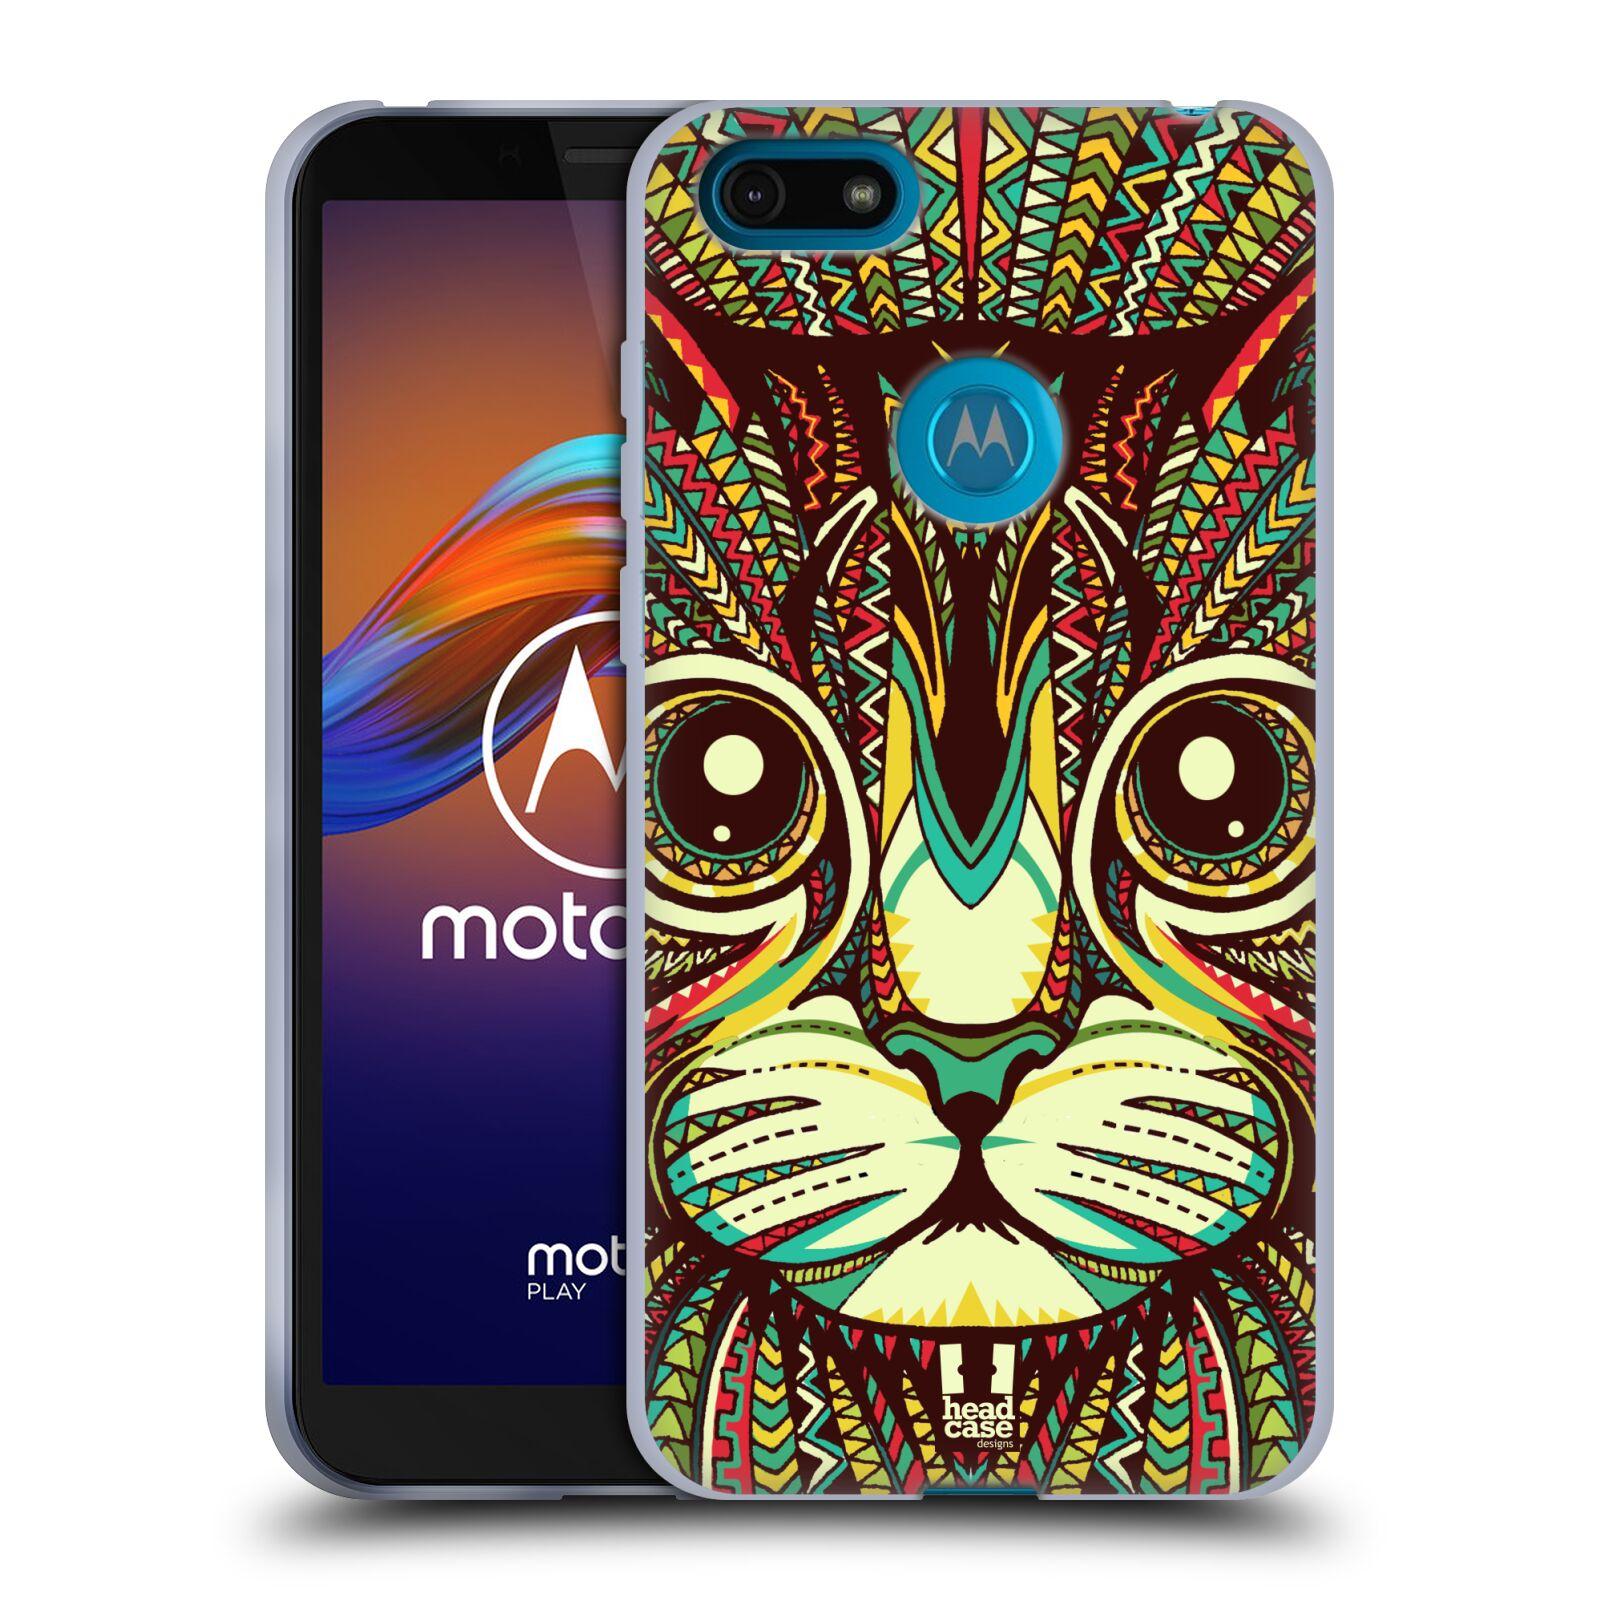 Silikonové pouzdro na mobil Motorola Moto E6 Play - Head Case - AZTEC KOČKA